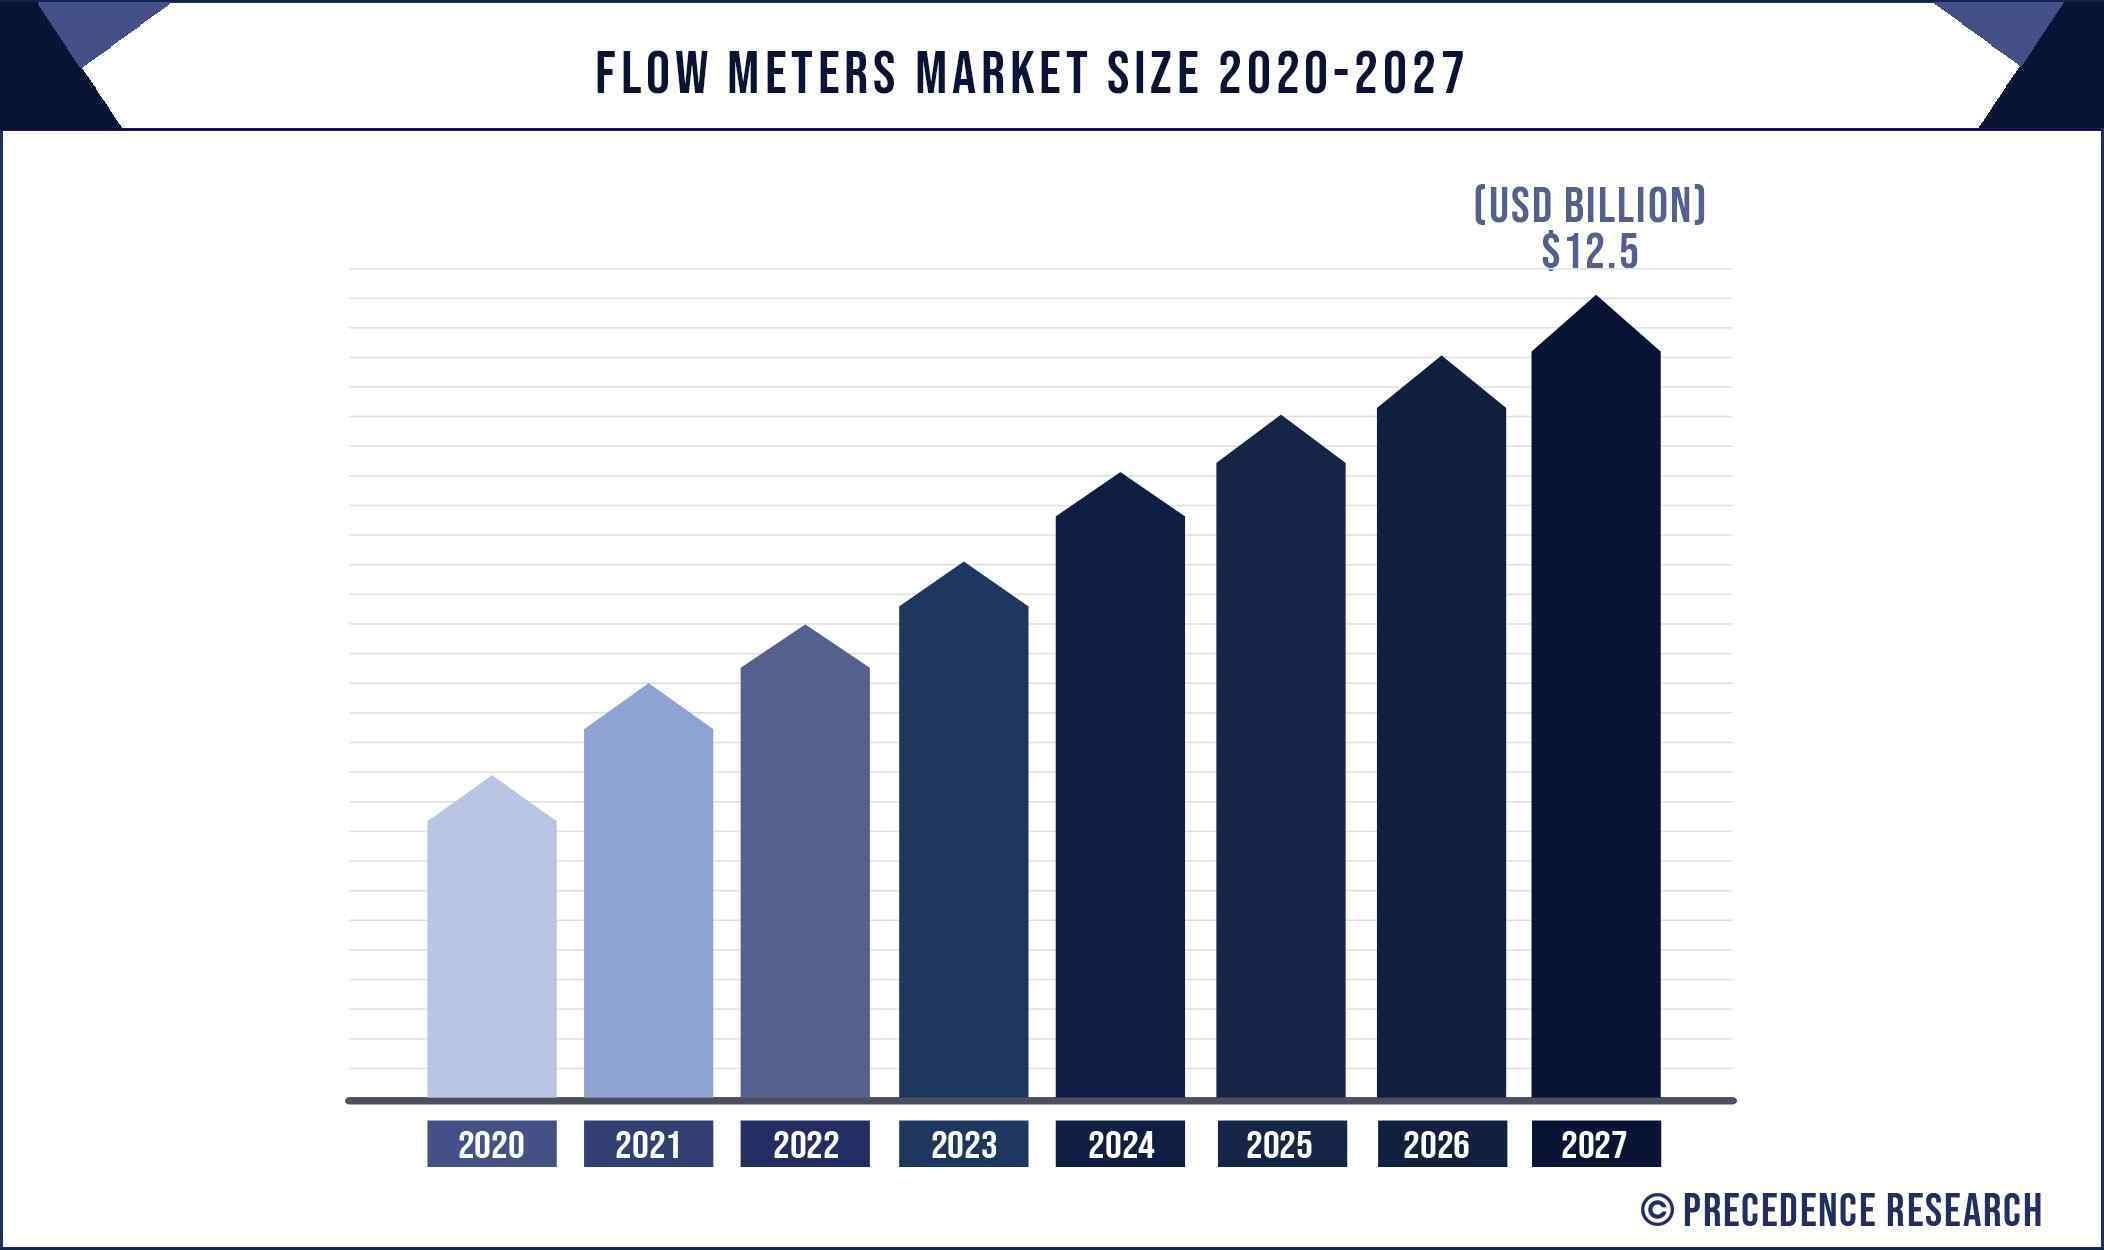 Flow Meters Market Size 2020 to 2027